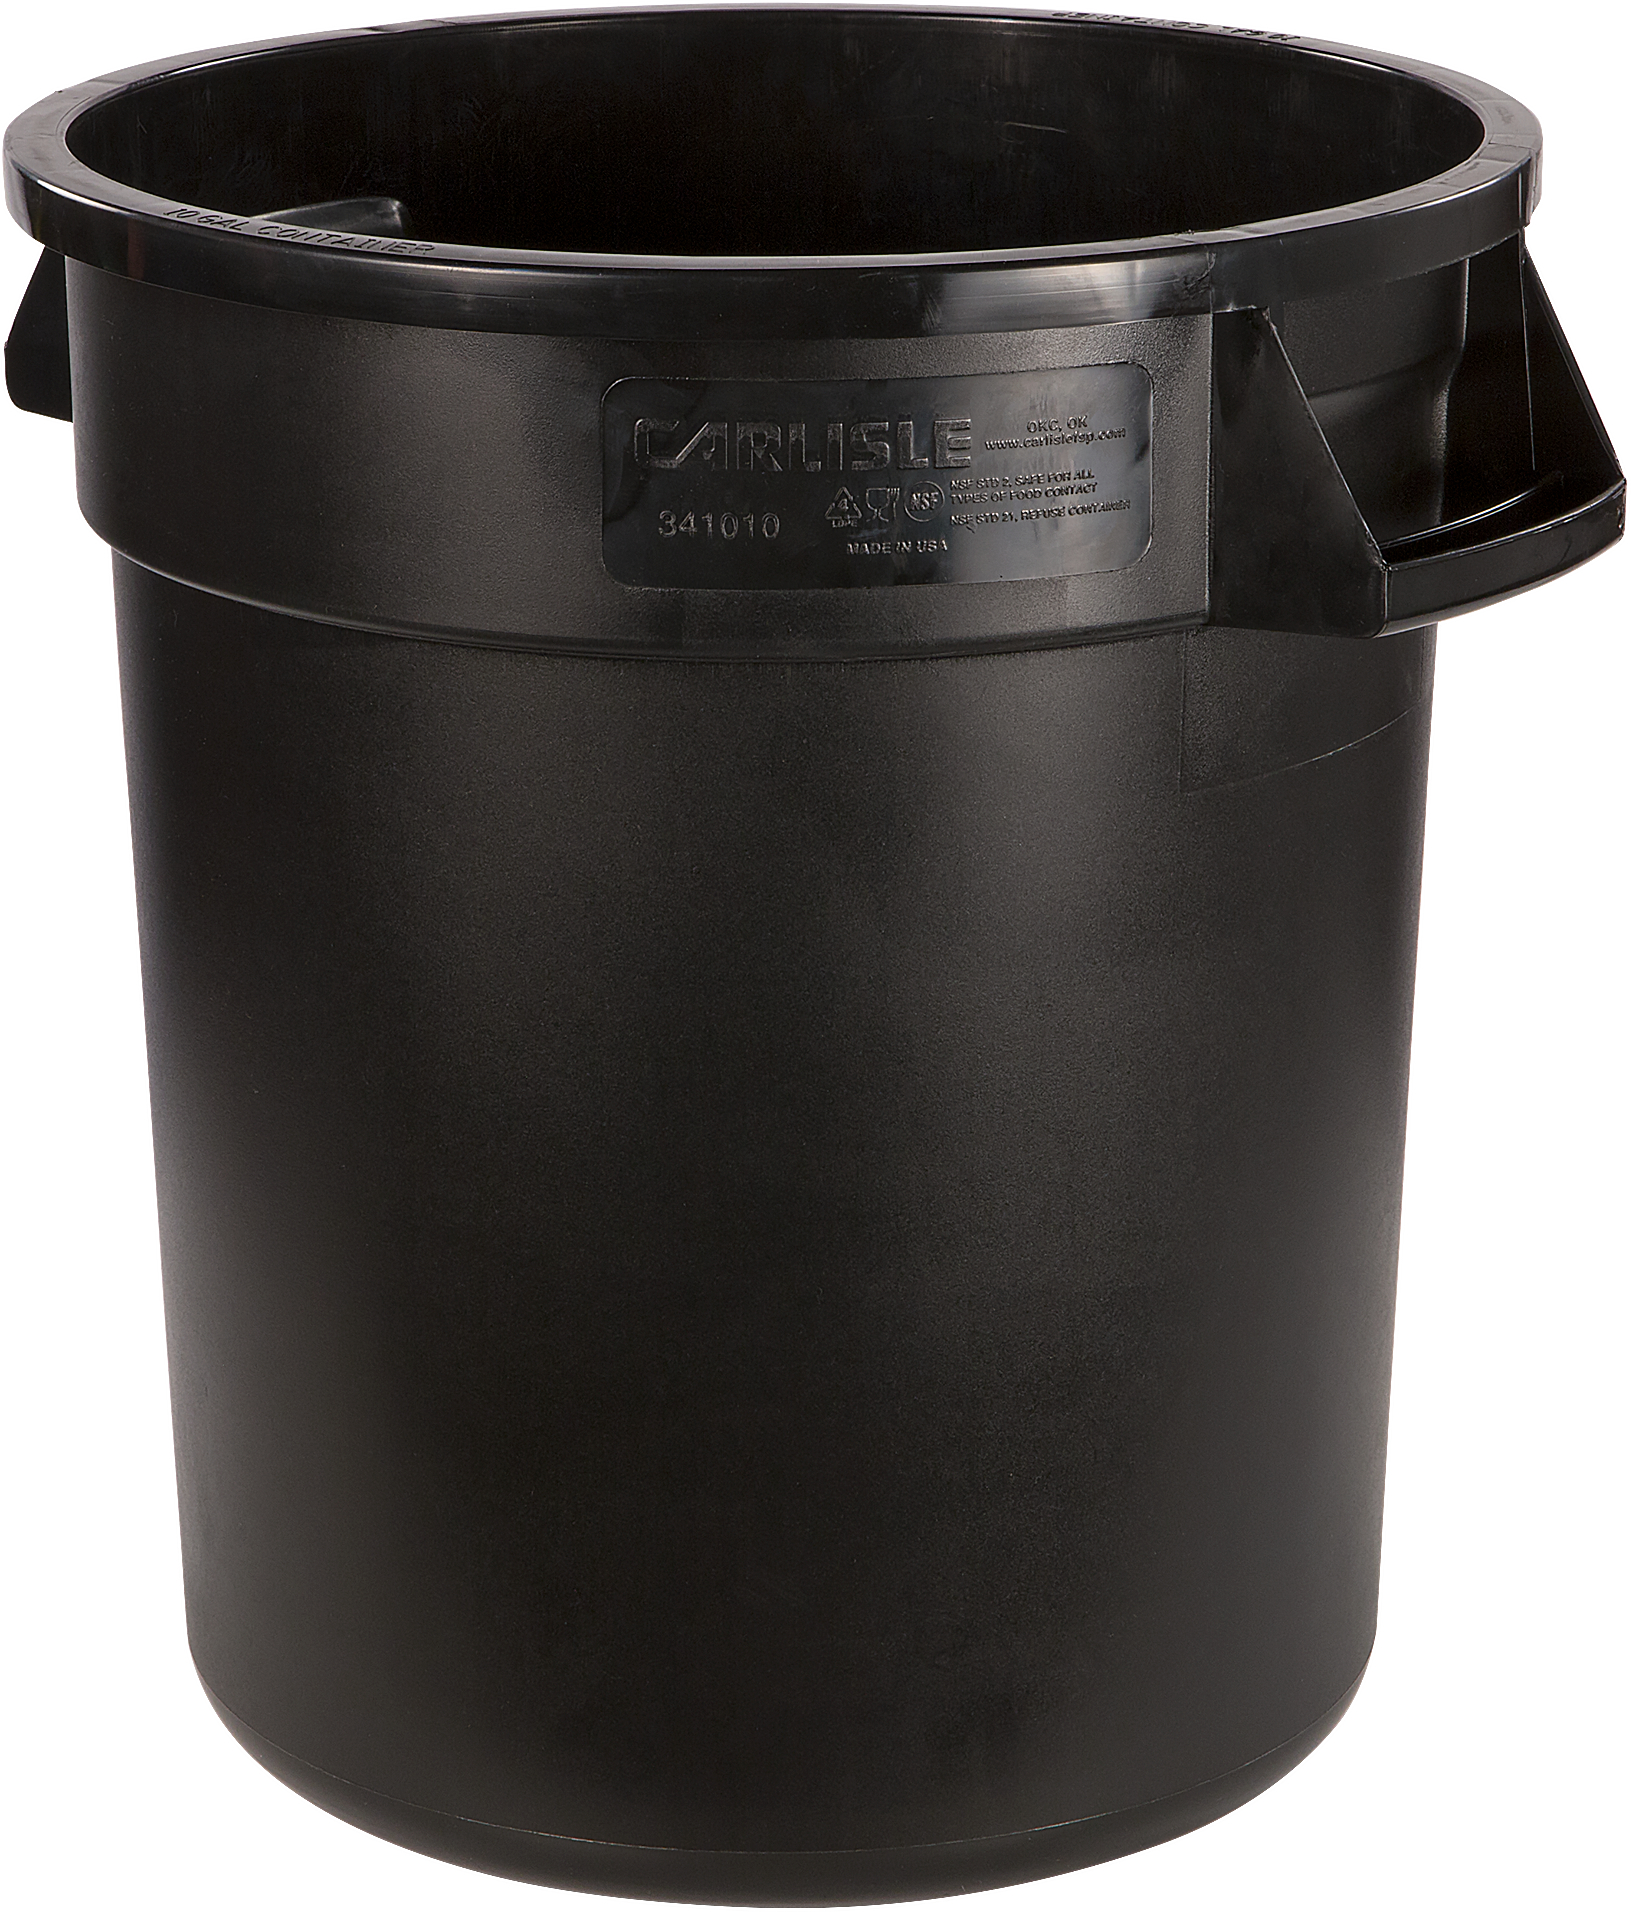 Bronco Round Waste Bin Food Container 10 Gallon - Black